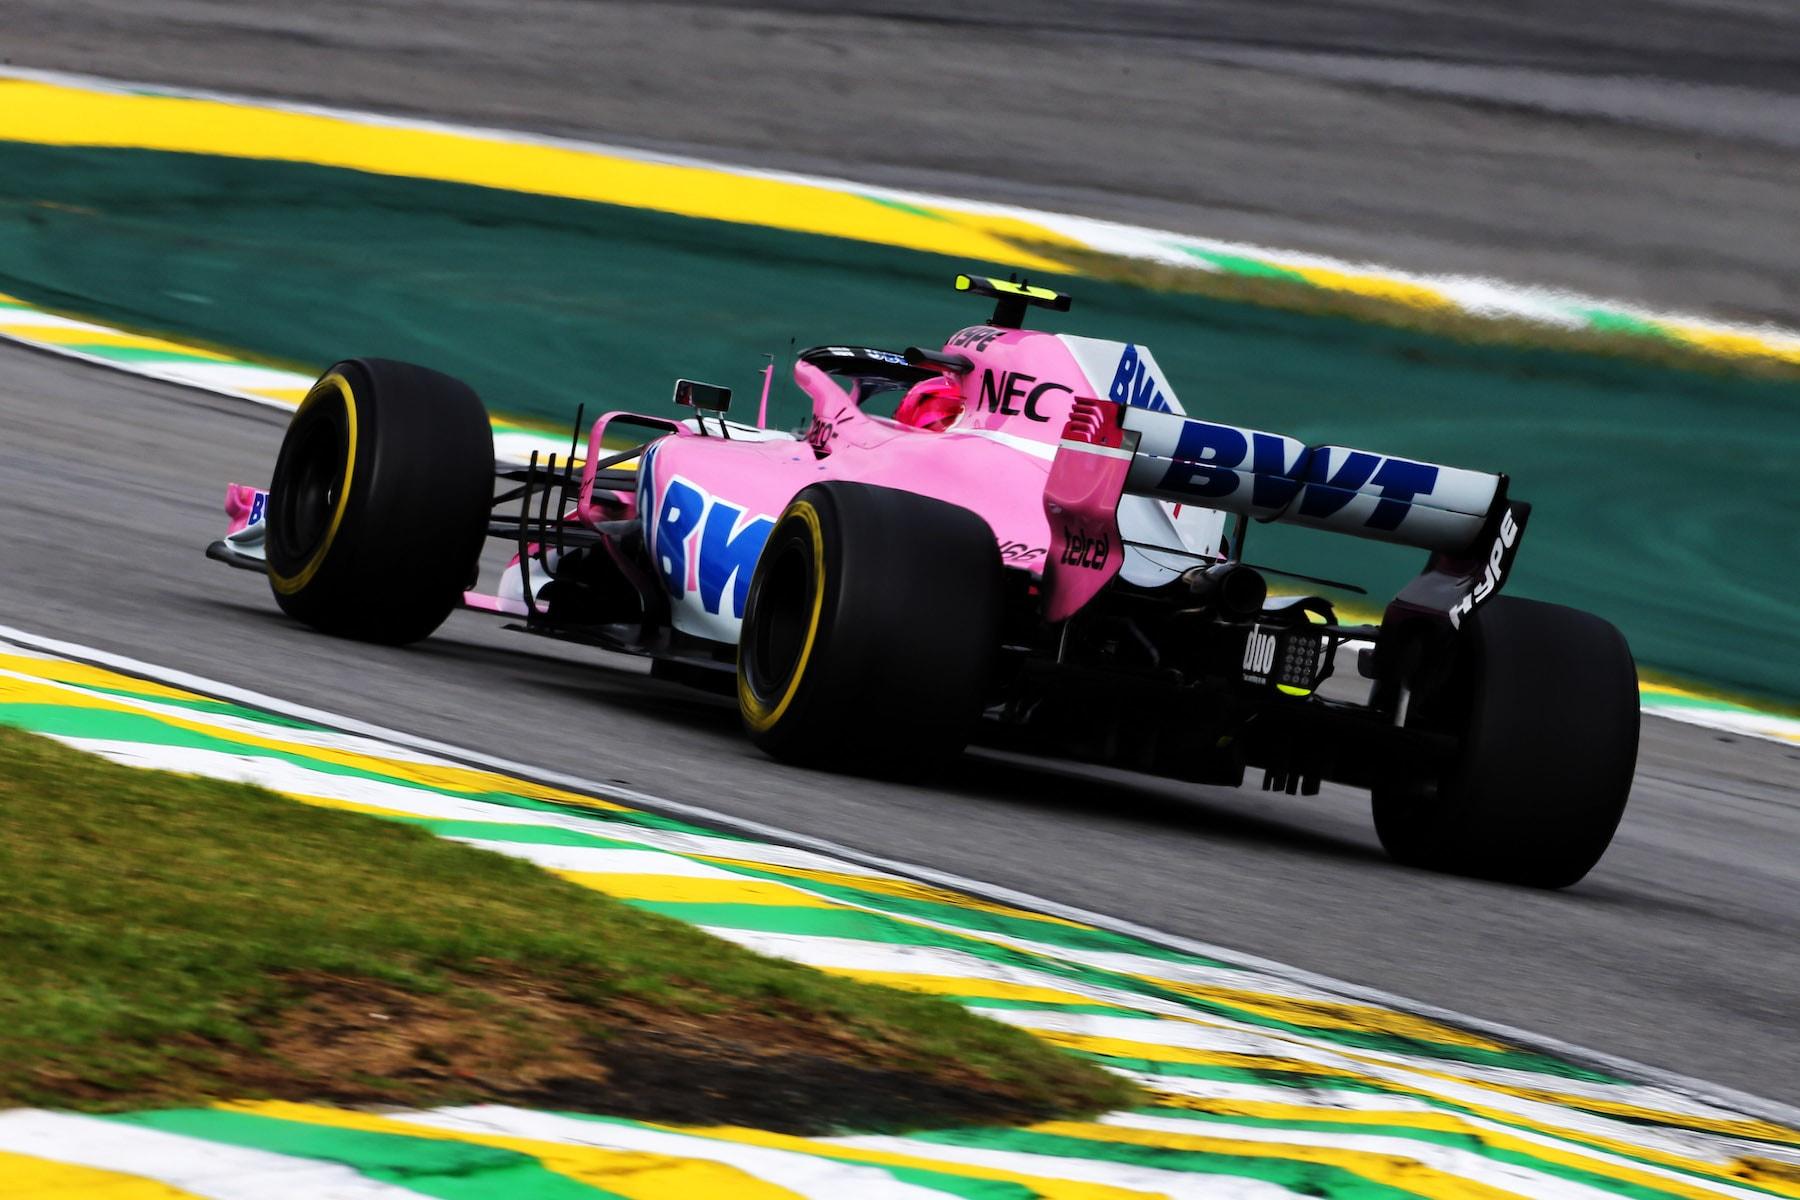 H 2018 Esteban Ocon | Force India VJM11 | 2018 Brazilian GP 1 copy.jpg